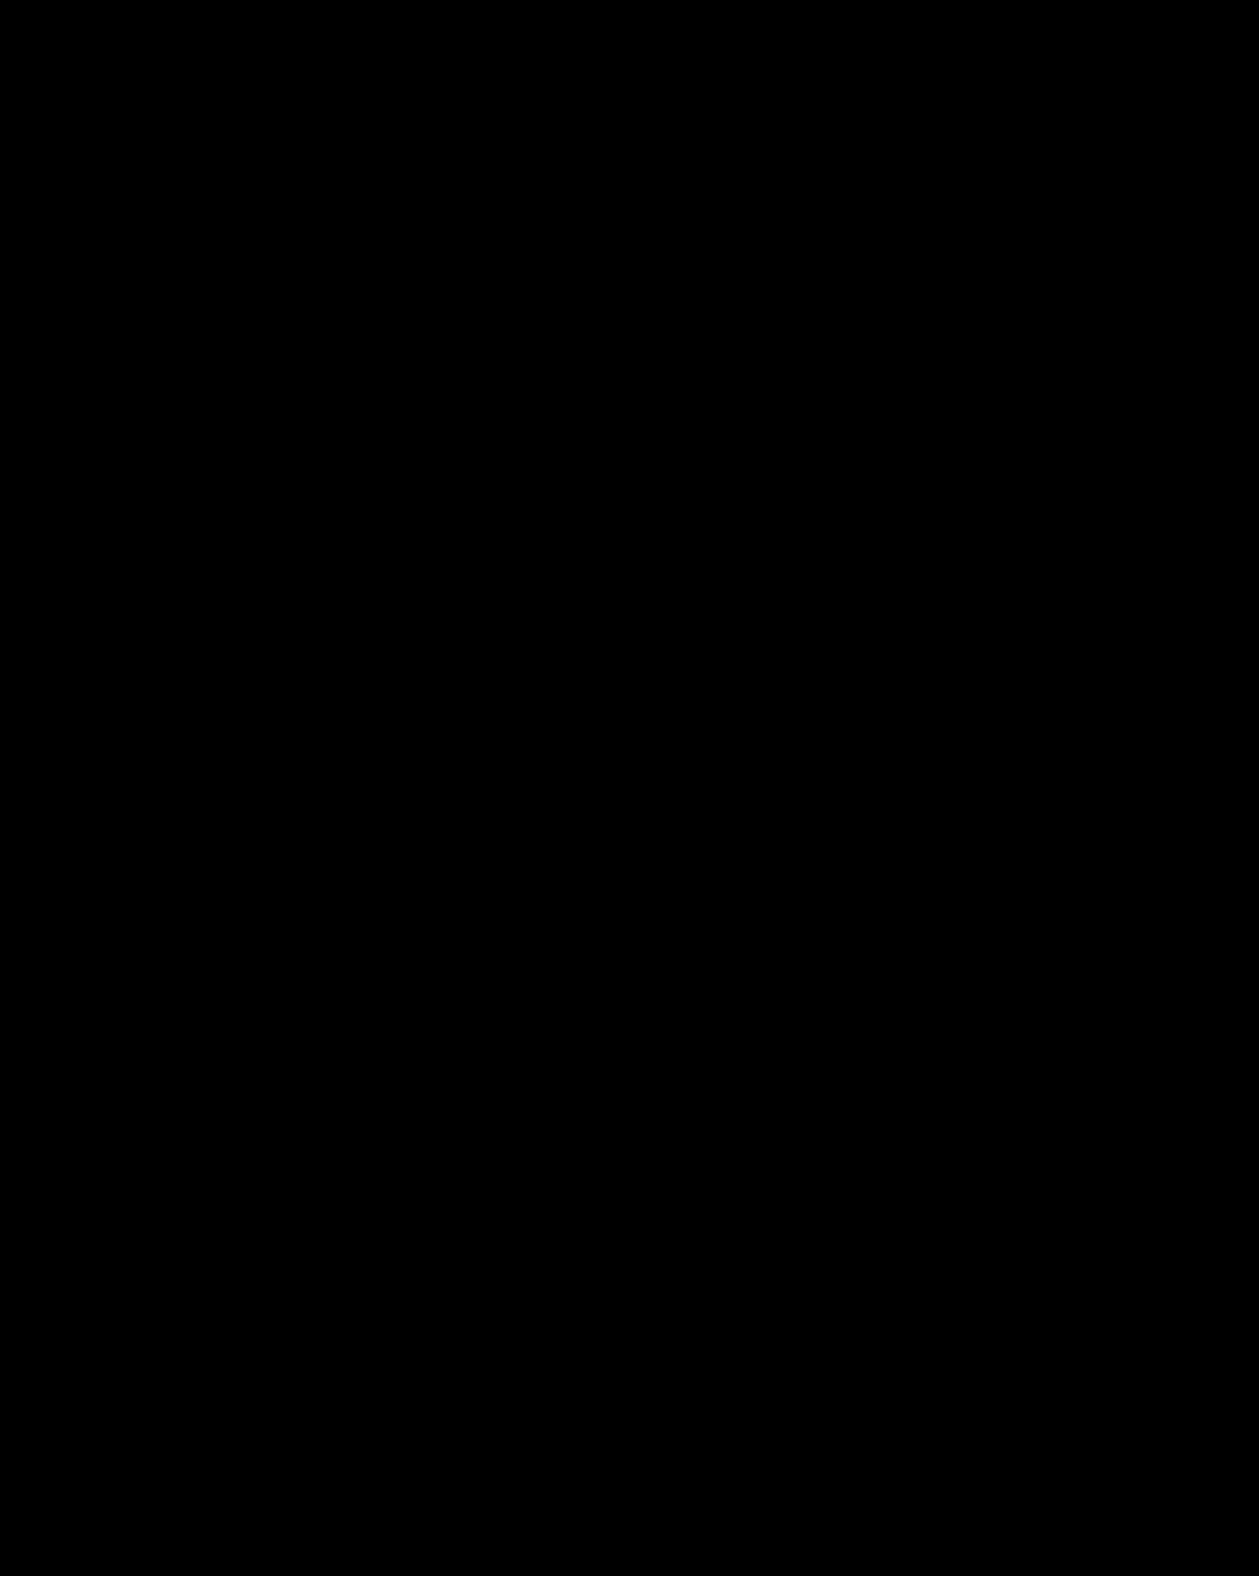 black transparent onlygfx. Coffee smoke png